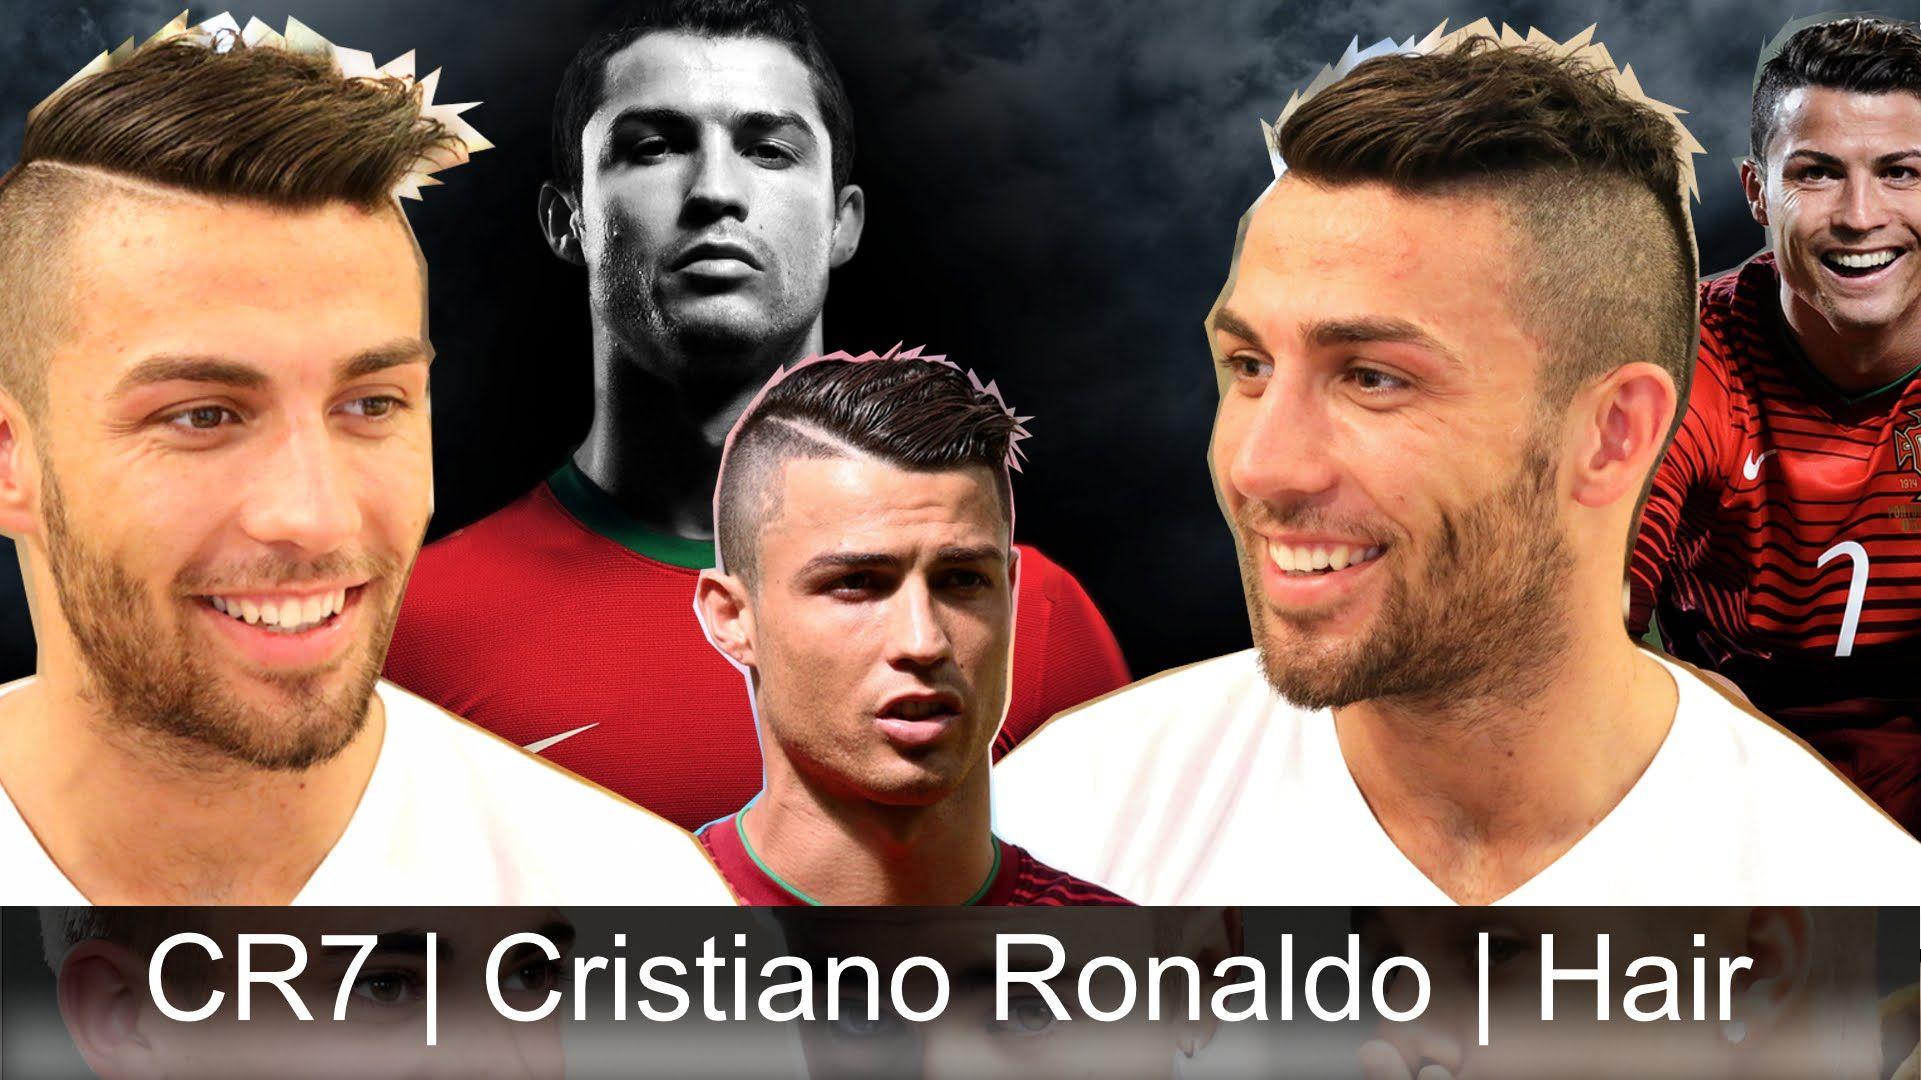 Hairstyle Like Cristiano Ronaldo CR Slikhaar TV Mens - Hairstyle like cristiano ronaldo cr7